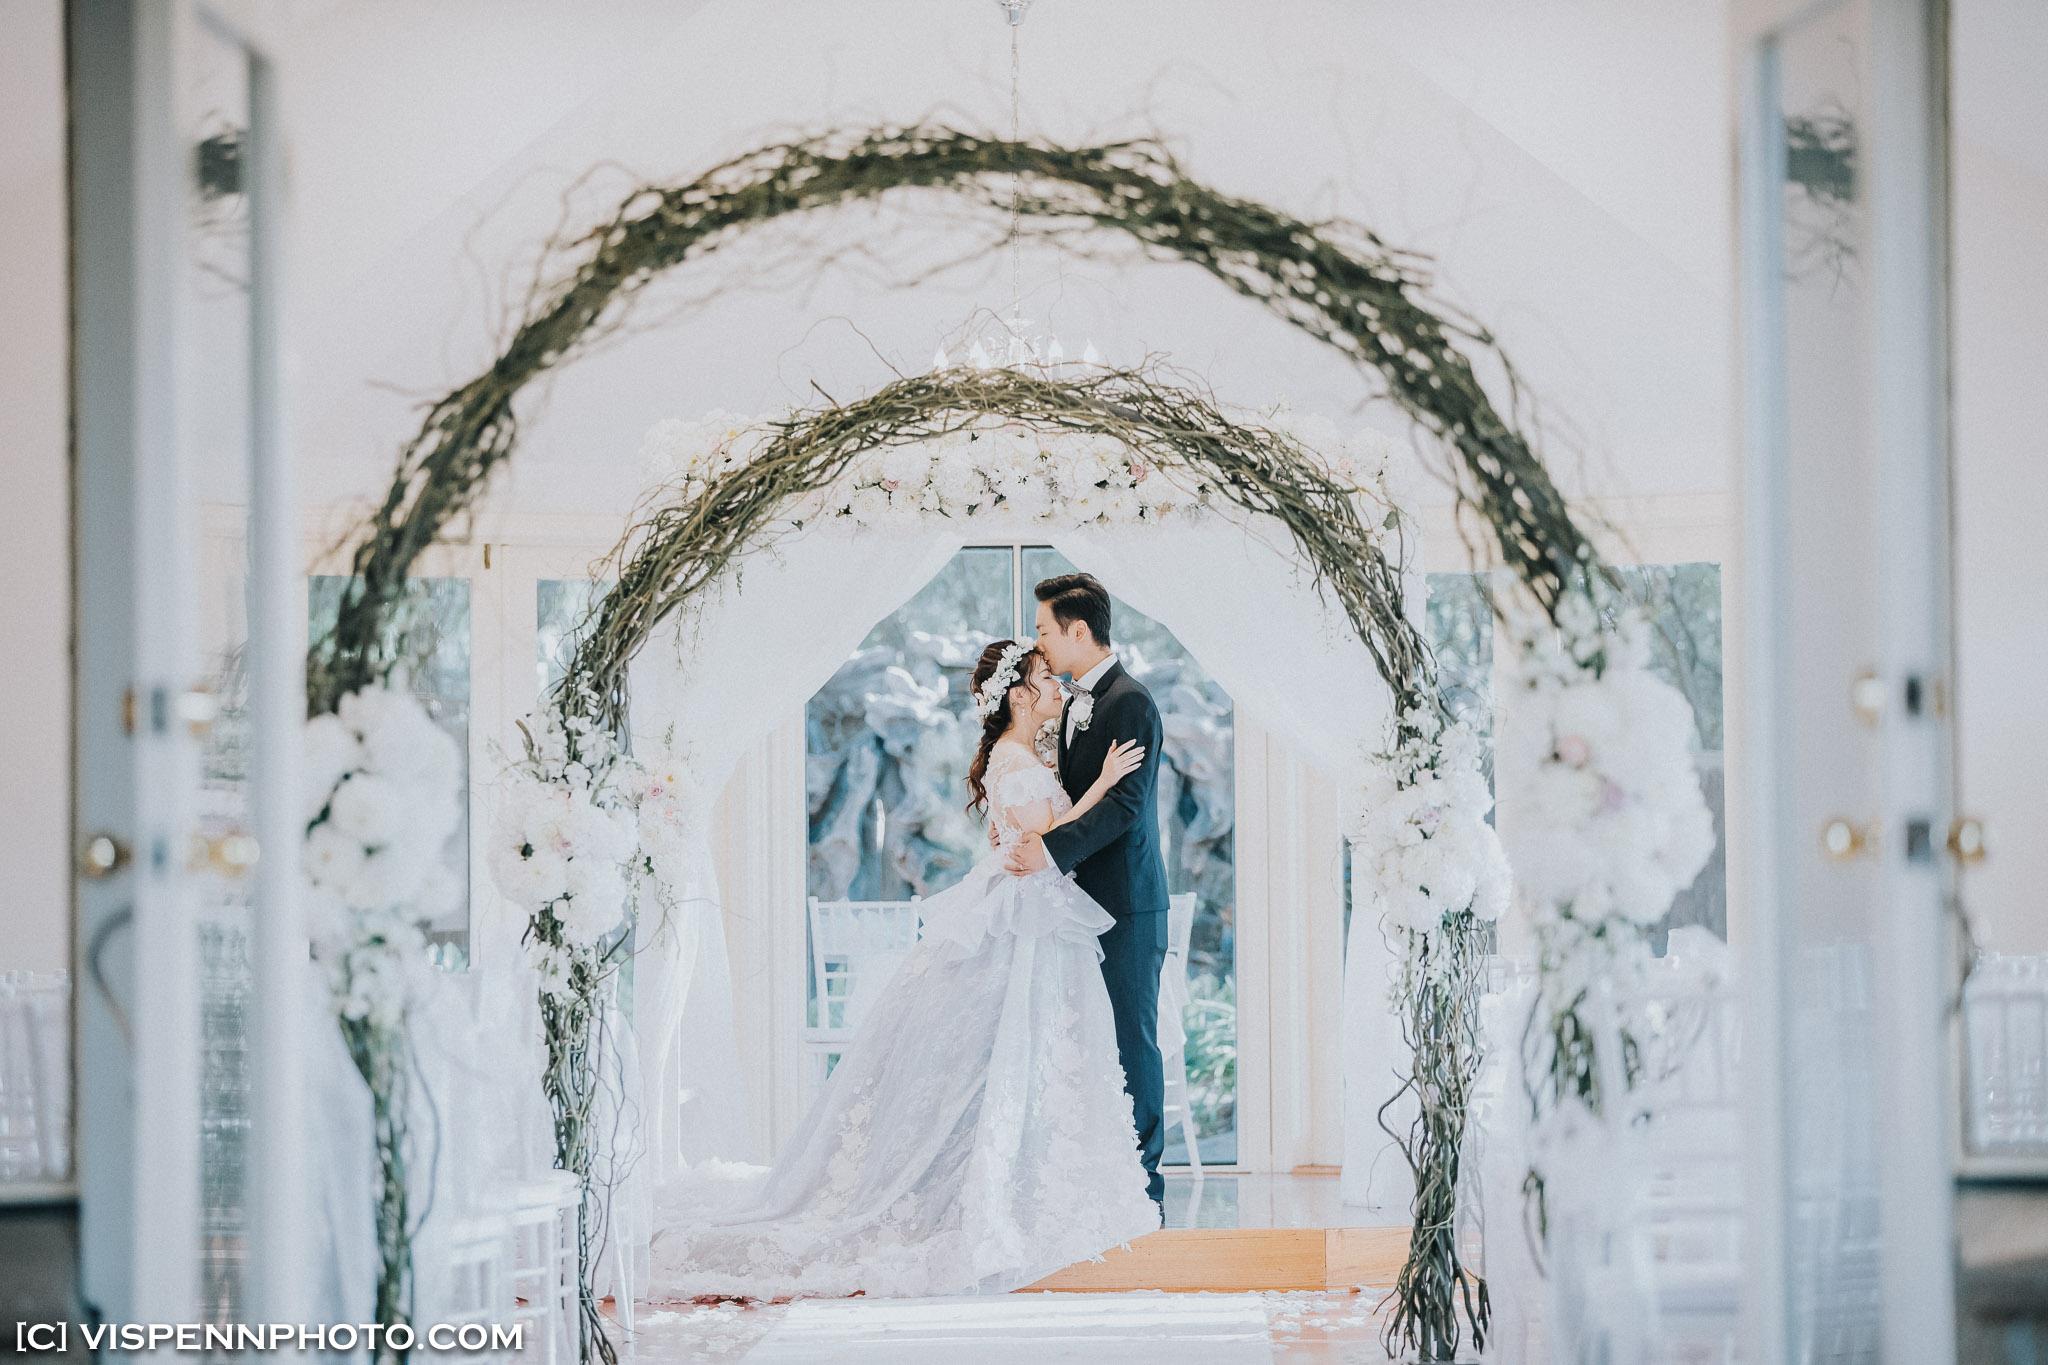 WEDDING DAY Photography Melbourne ZHPENN H4 0567